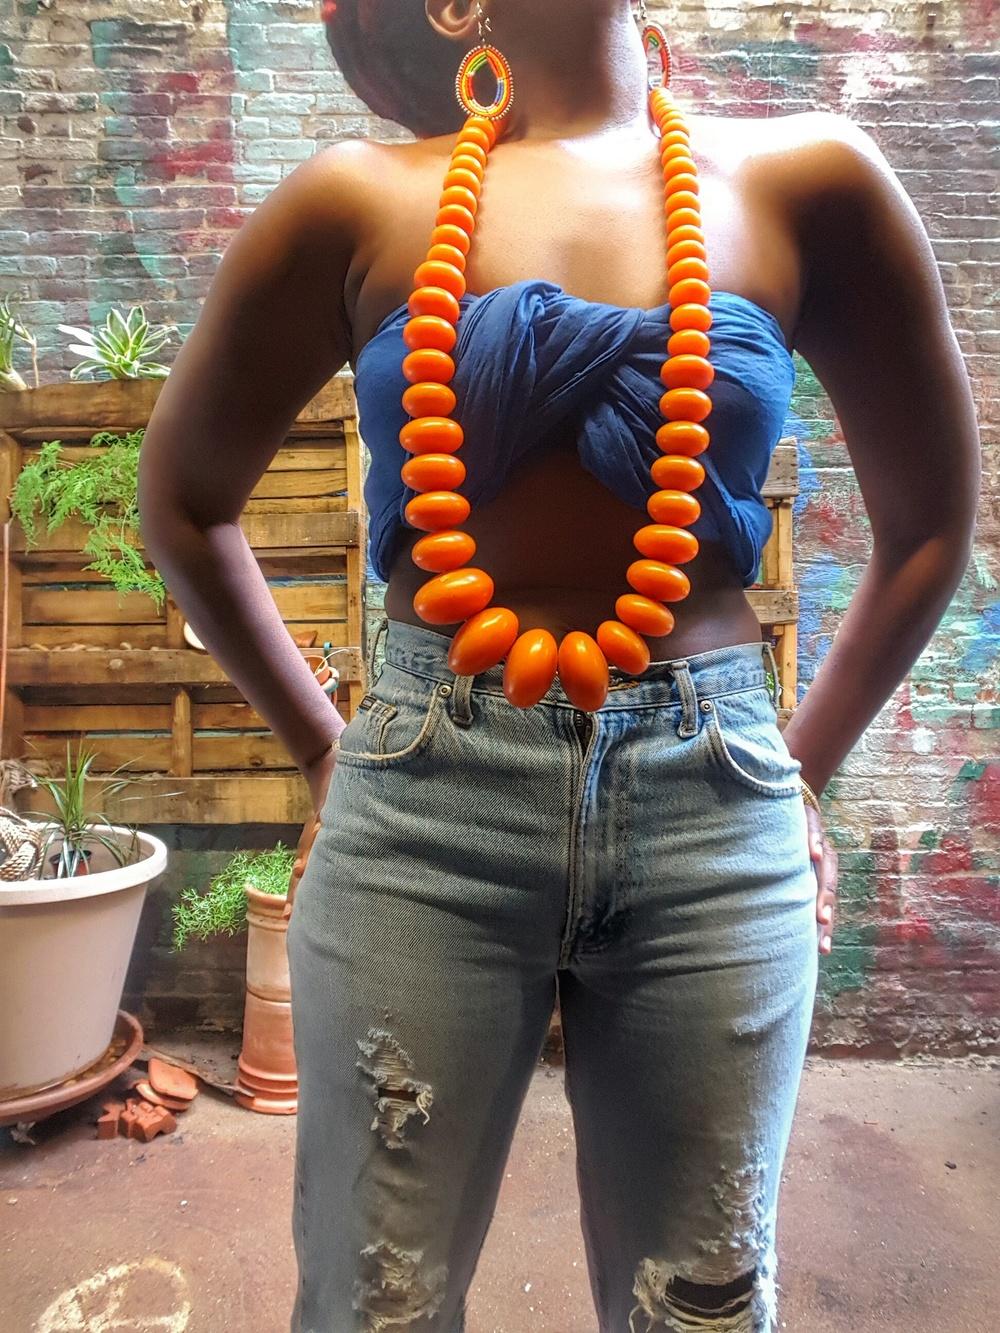 Queen adwoa's Closet Amber Necklace